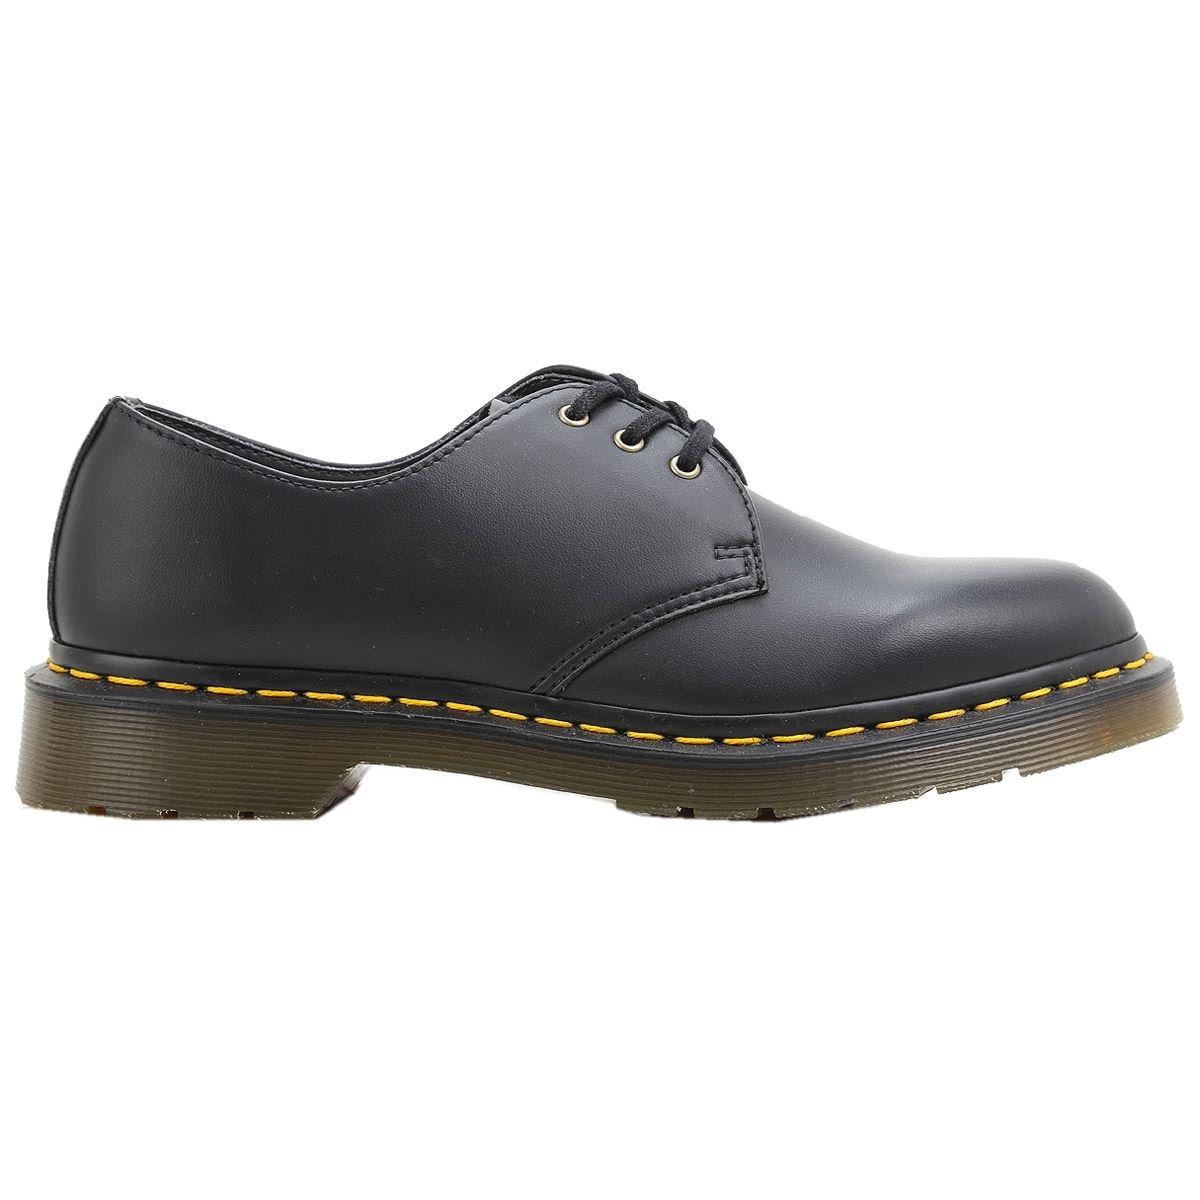 cfaabd9305b64 Galleon - Dr. Martens Unisex-Adult's 1461 Vegan Felix Rub Off Shoes - 6.5 D(M)  US / 9 B(M) US, (Black)